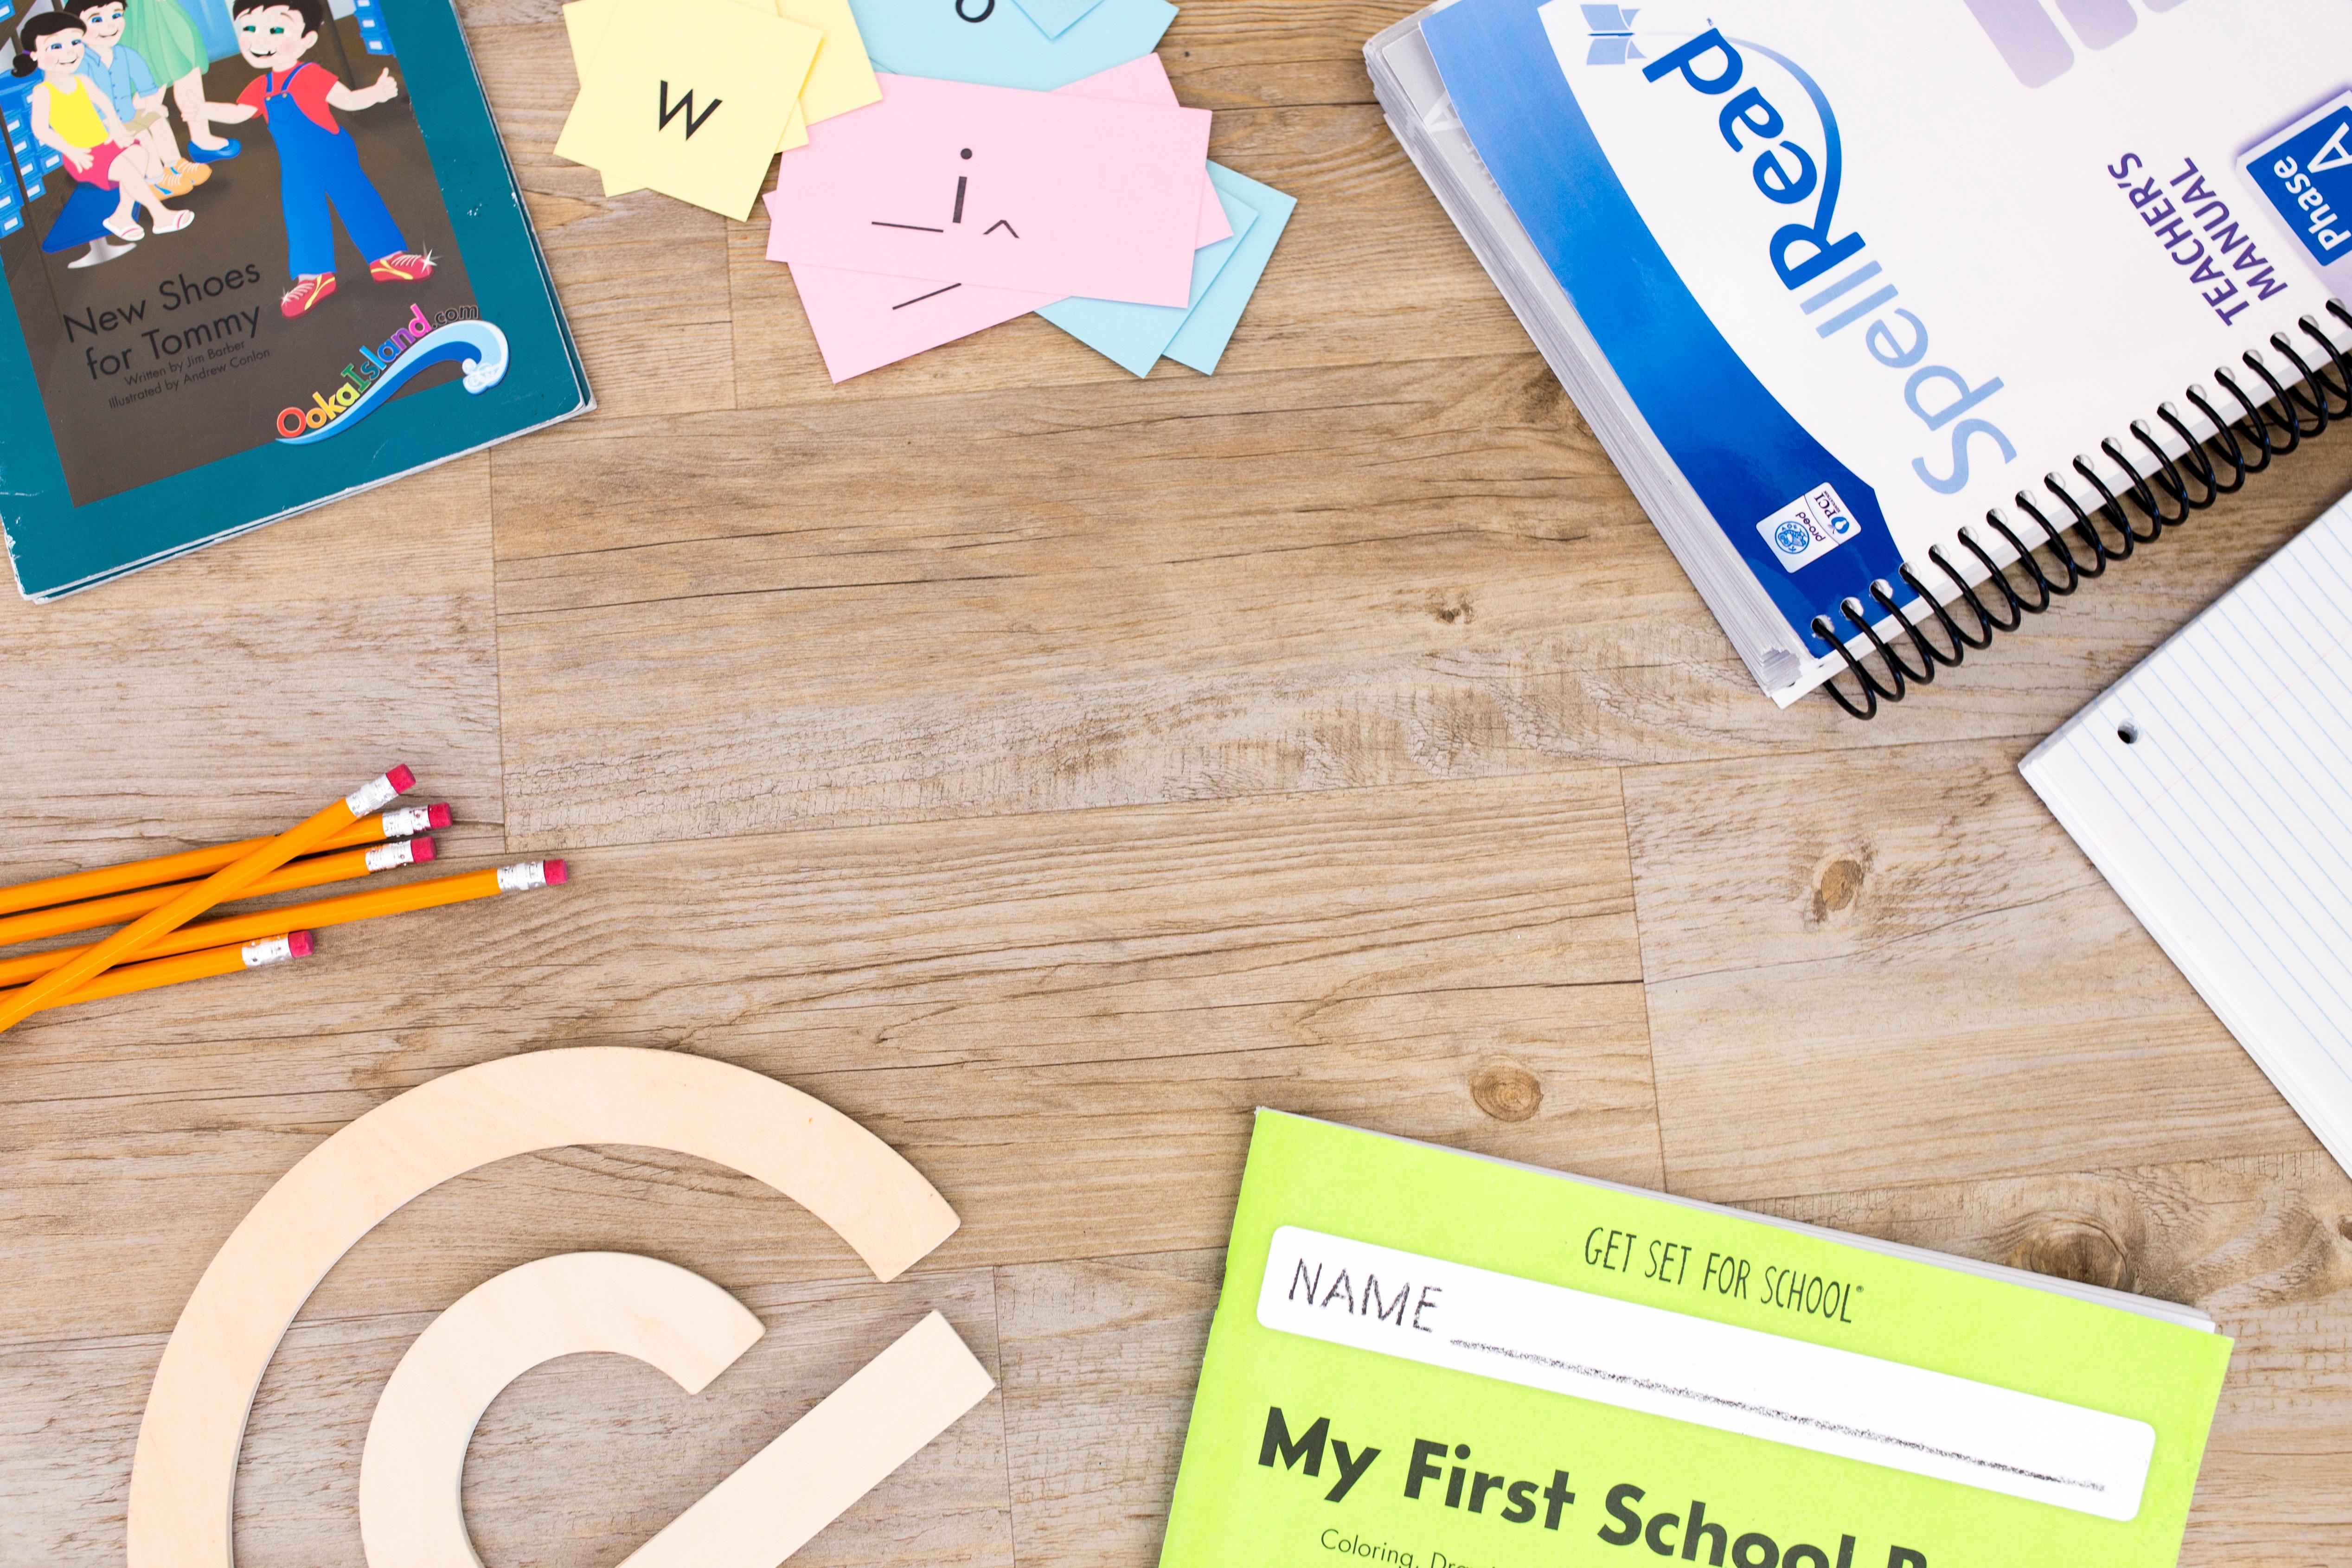 halifax learning spellread read write learn tutor tutoring evidence-based education